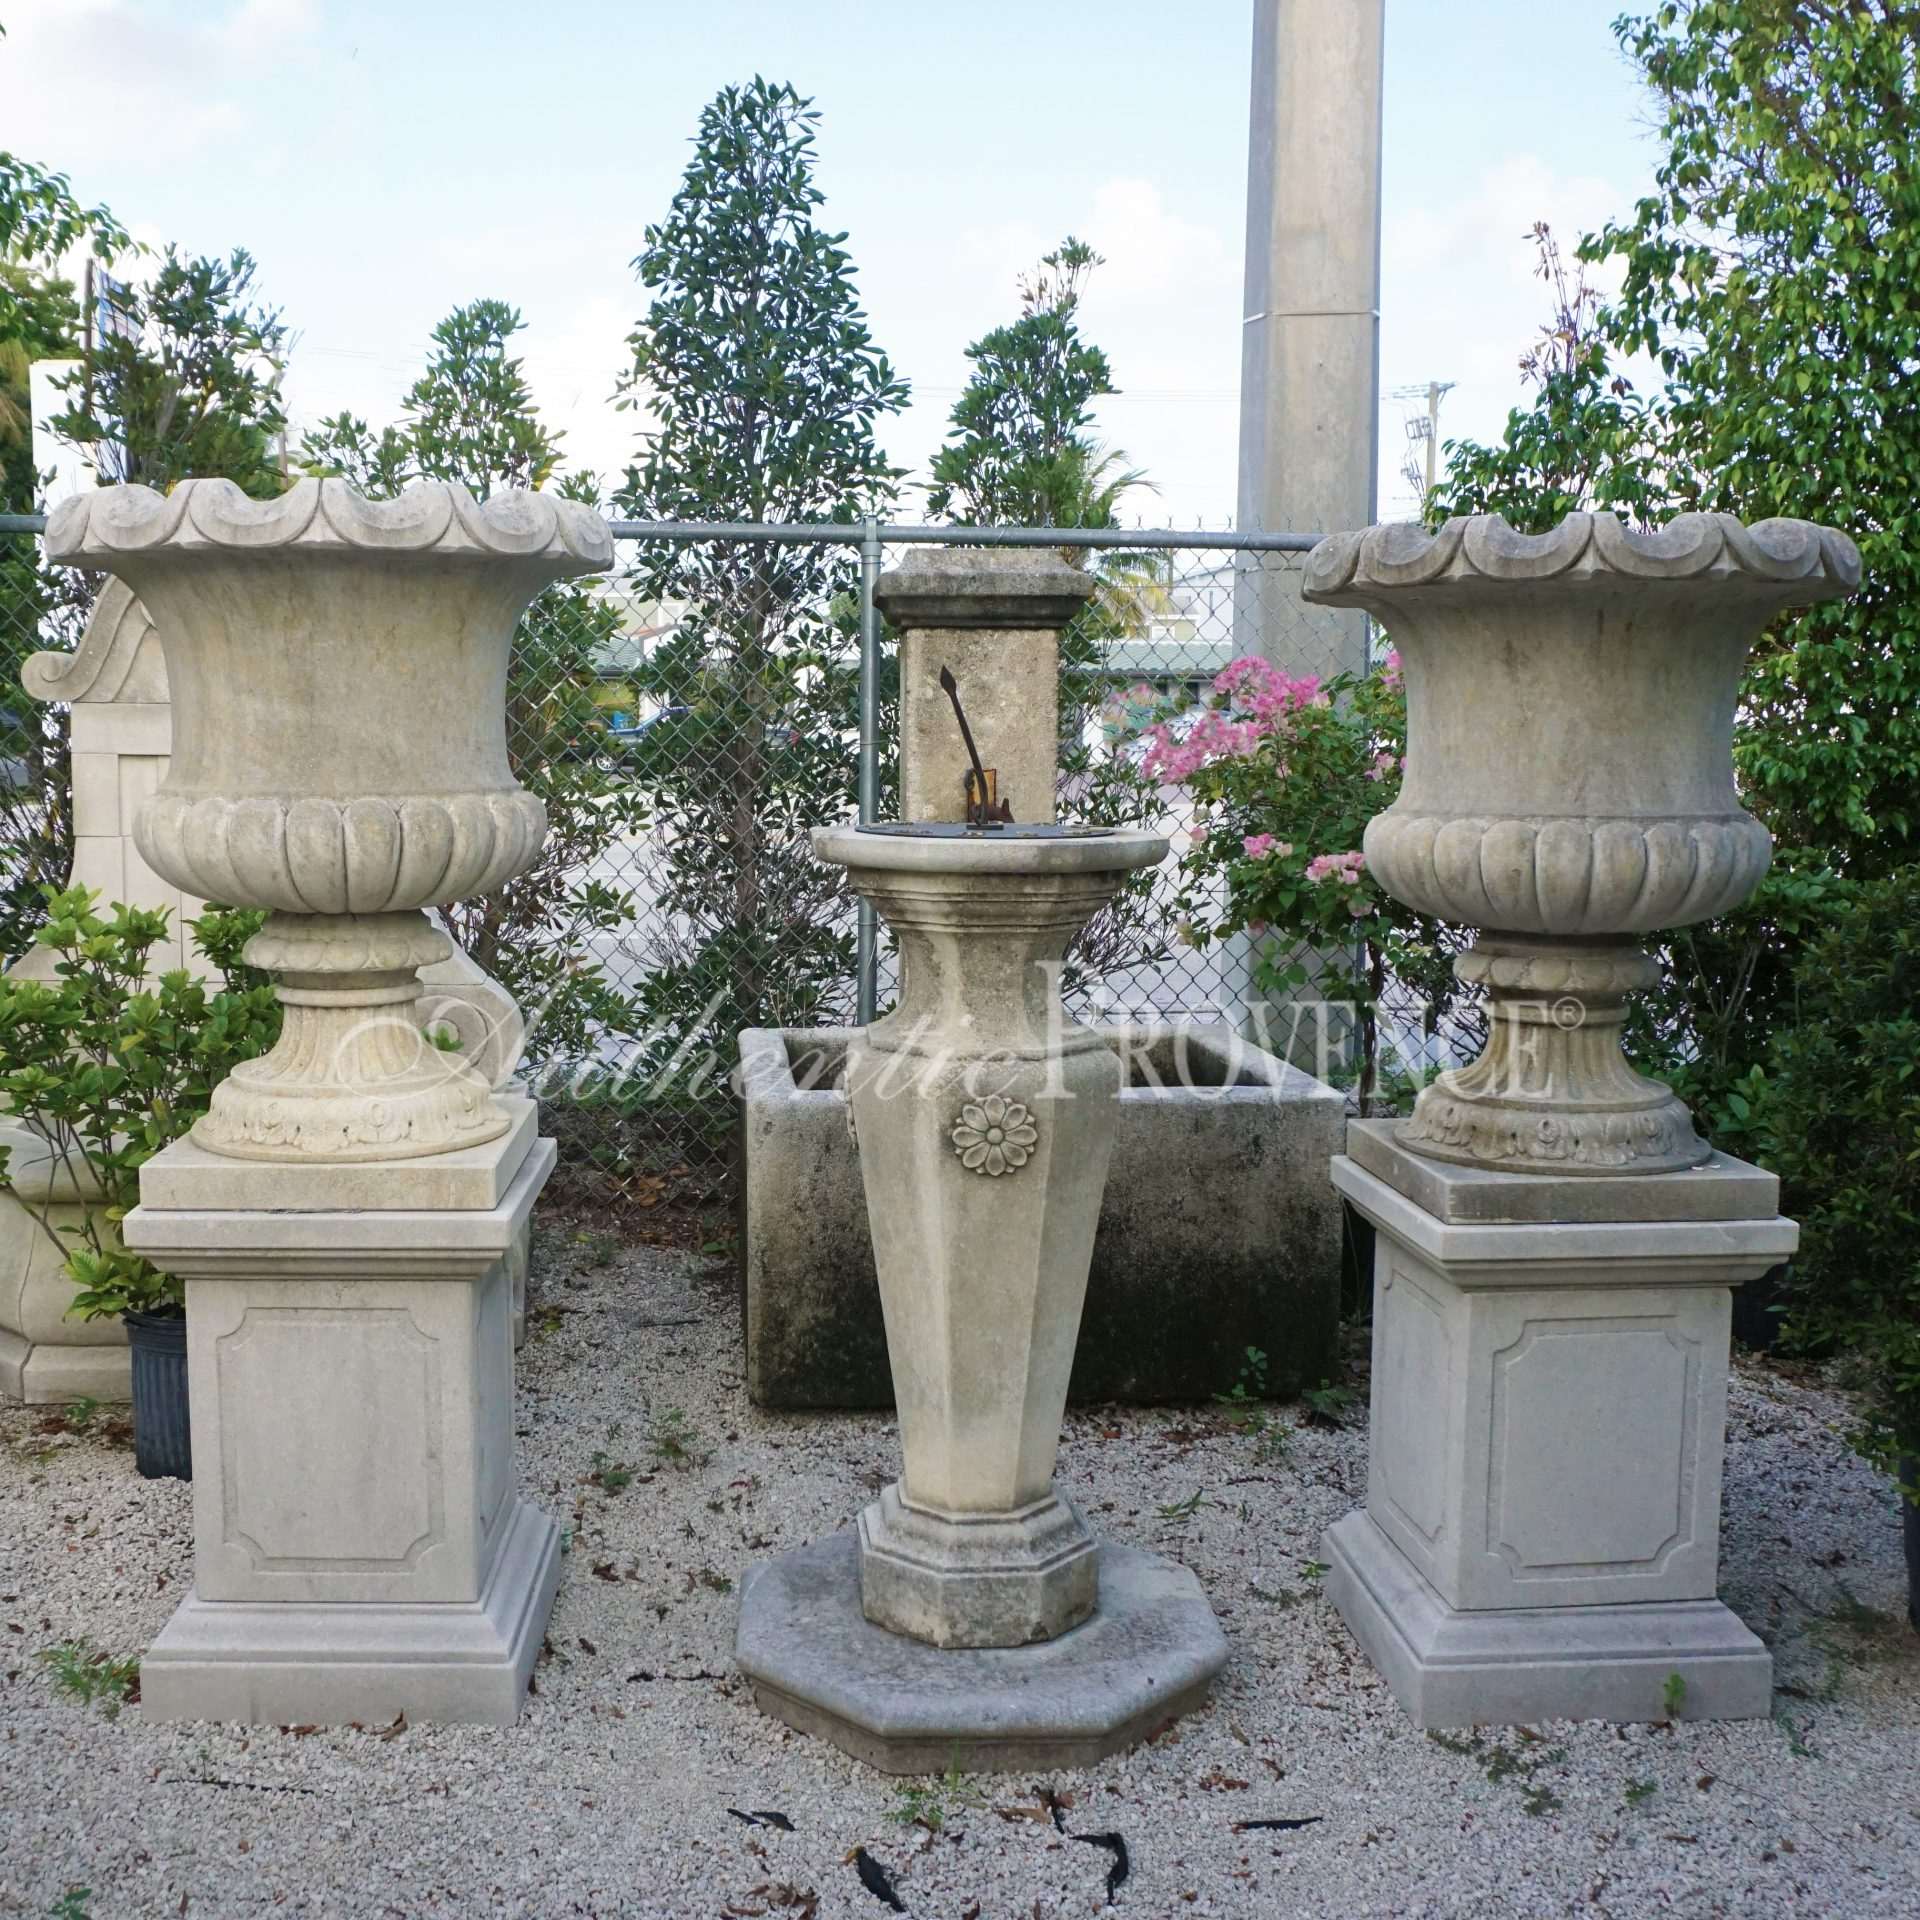 Pair of Campana Urns